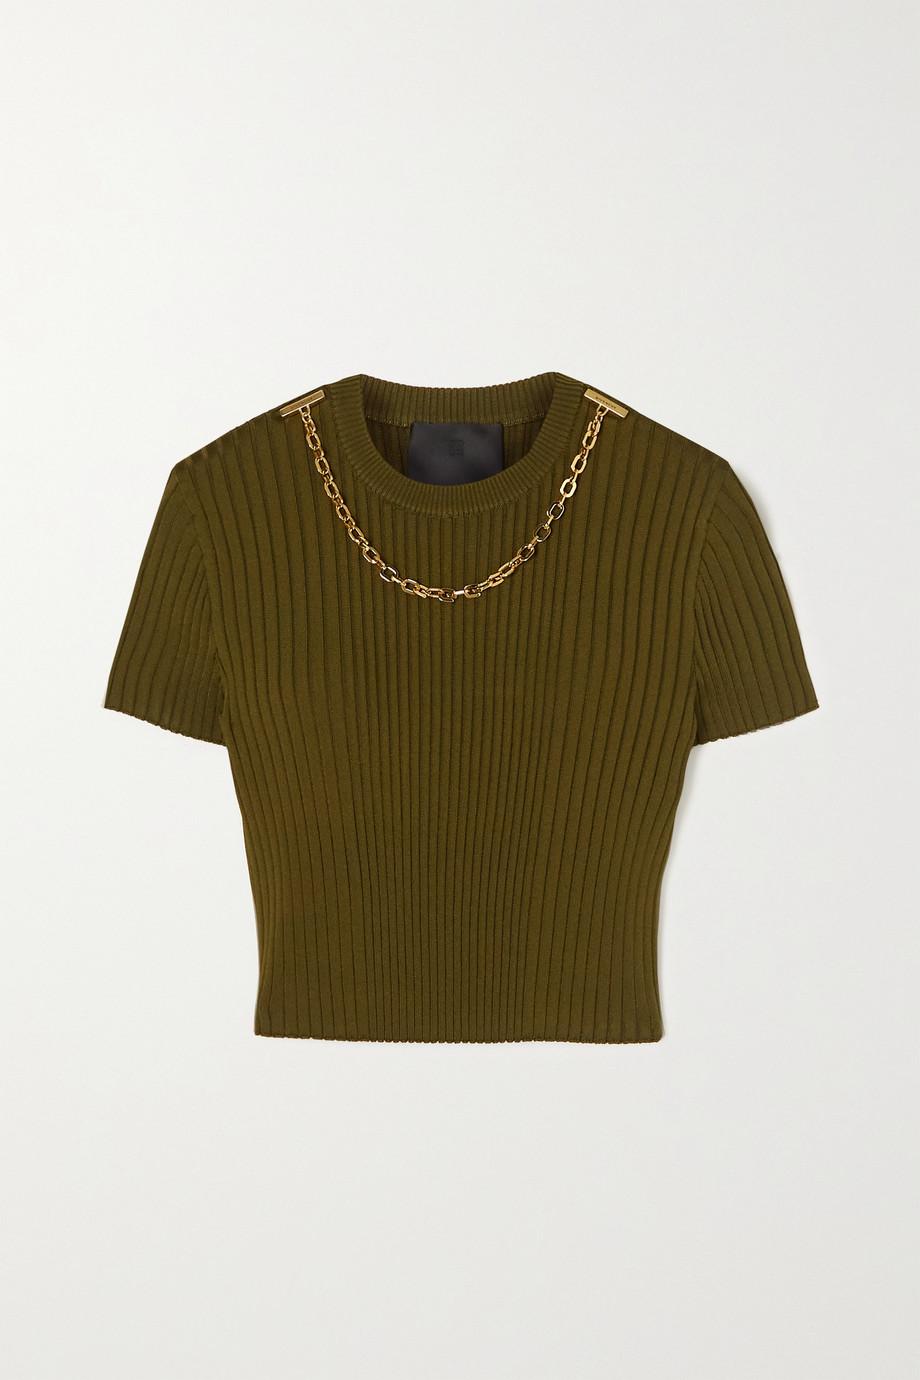 Givenchy T-shirt raccourci en jersey côtelé à chaîne